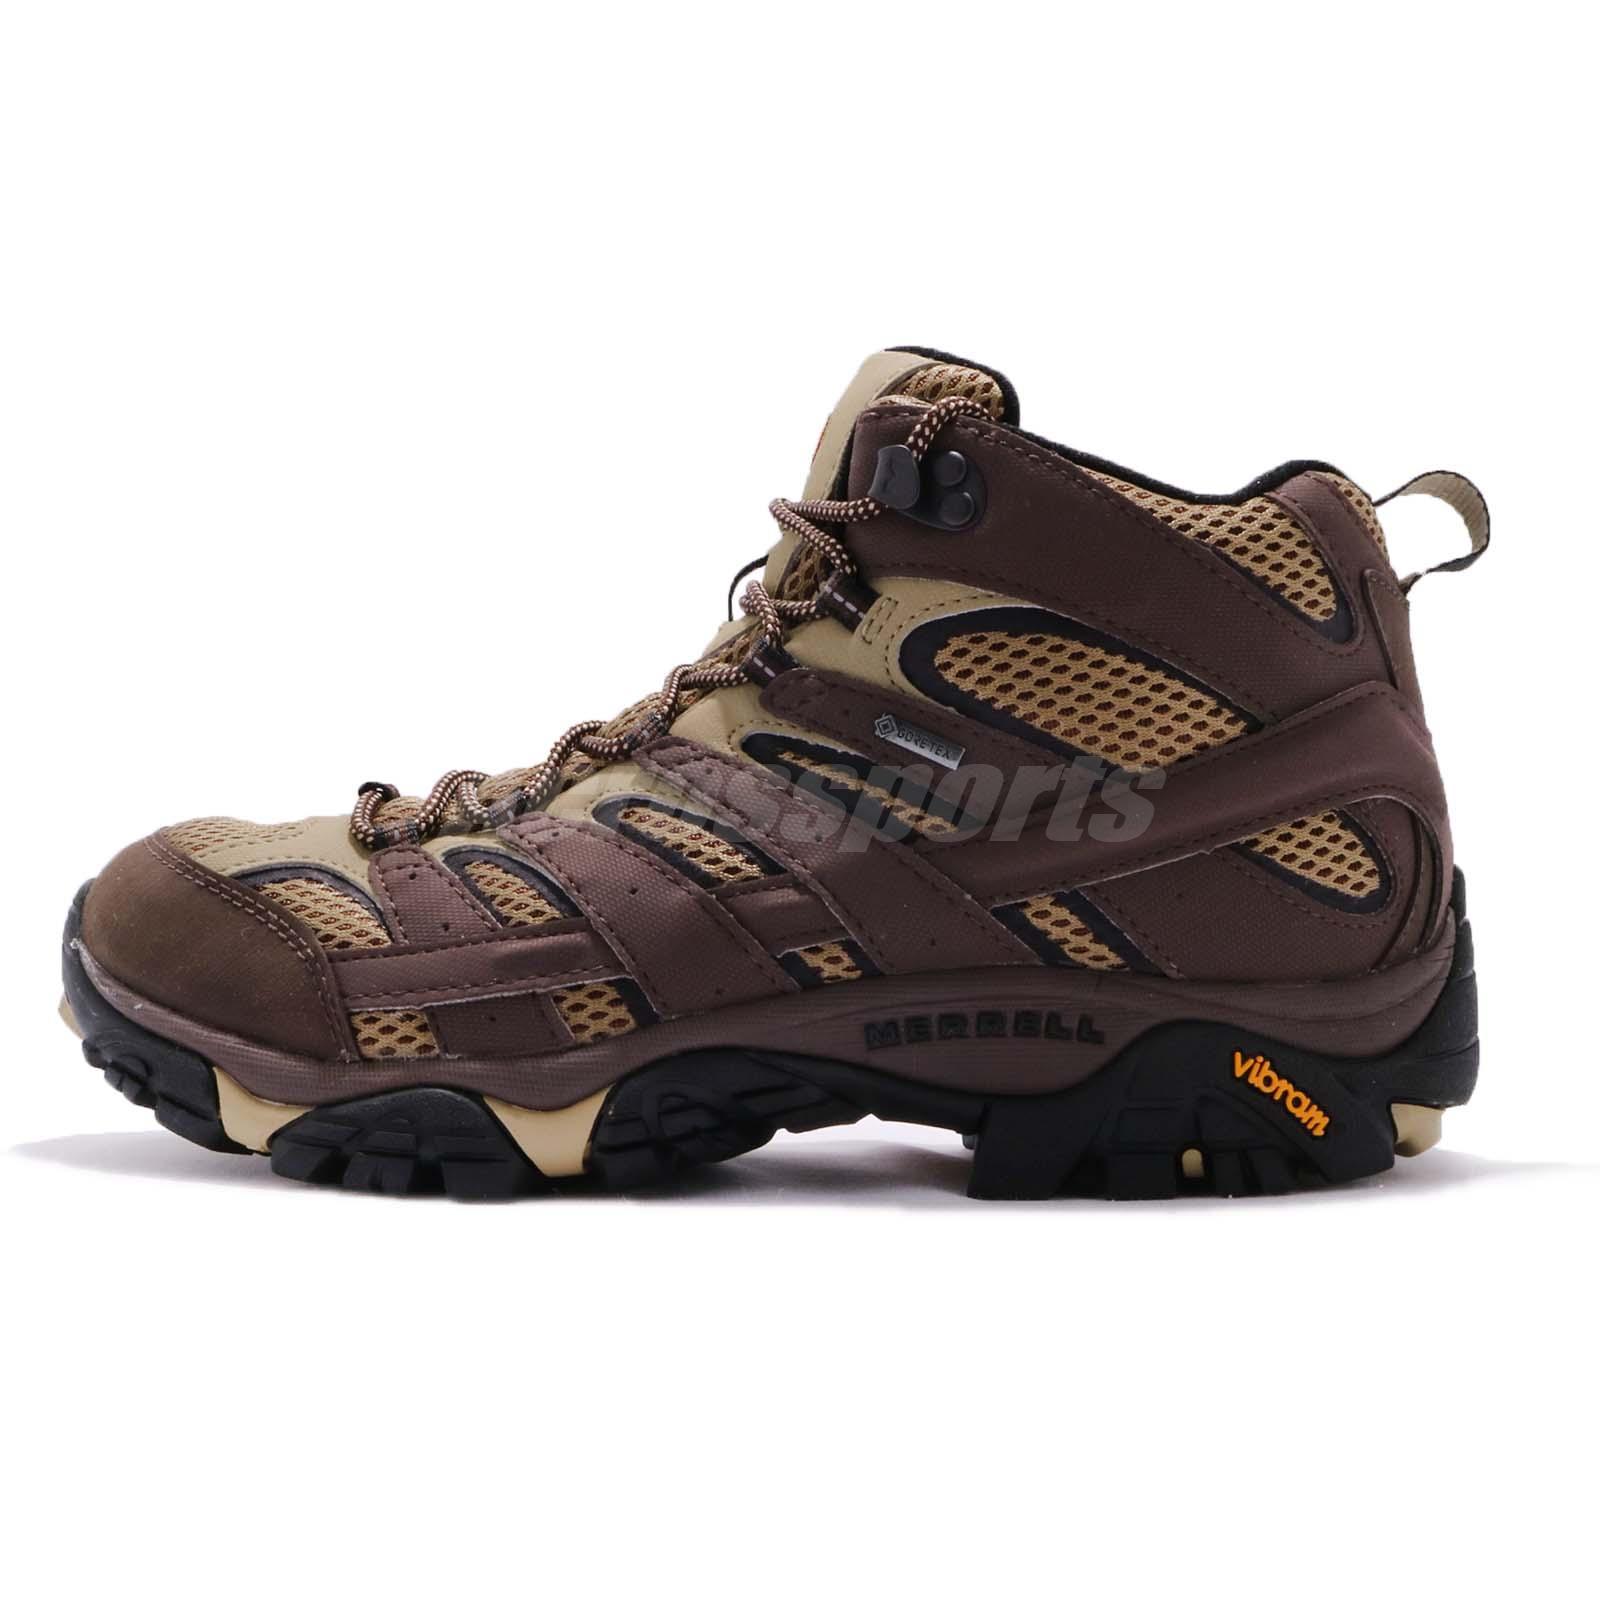 137fd44170 Merrell Moab 2 Mid GTX Gore-Tex Vibram Brown Men Outdoors Trail Shoes J12117